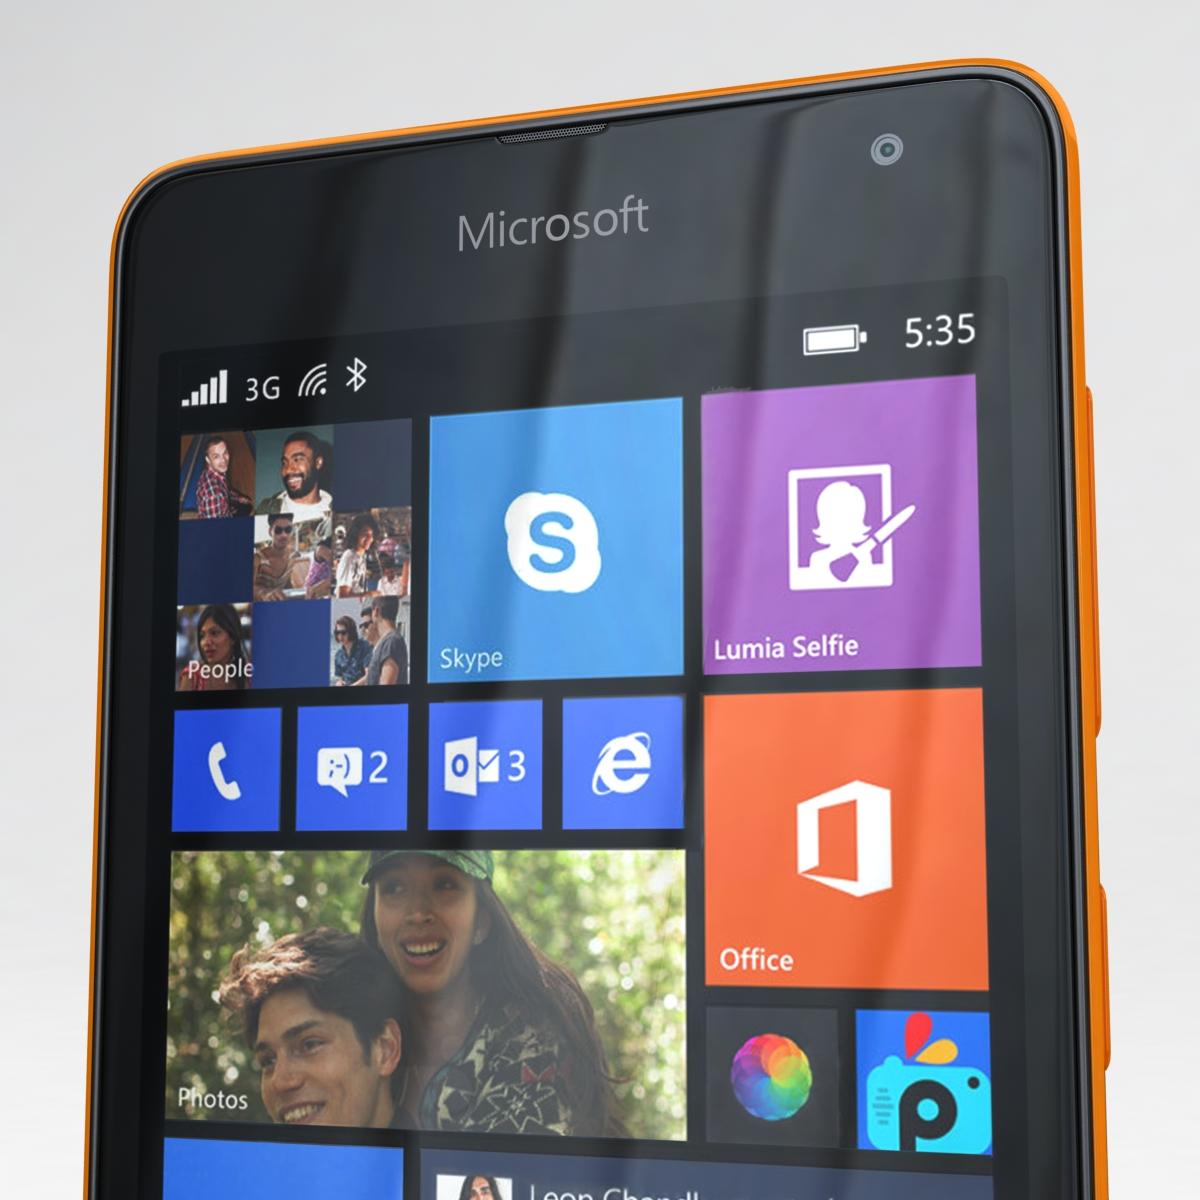 microsoft lumia 535 and dual sim orange 3d model 3ds max fbx c4d obj 204124